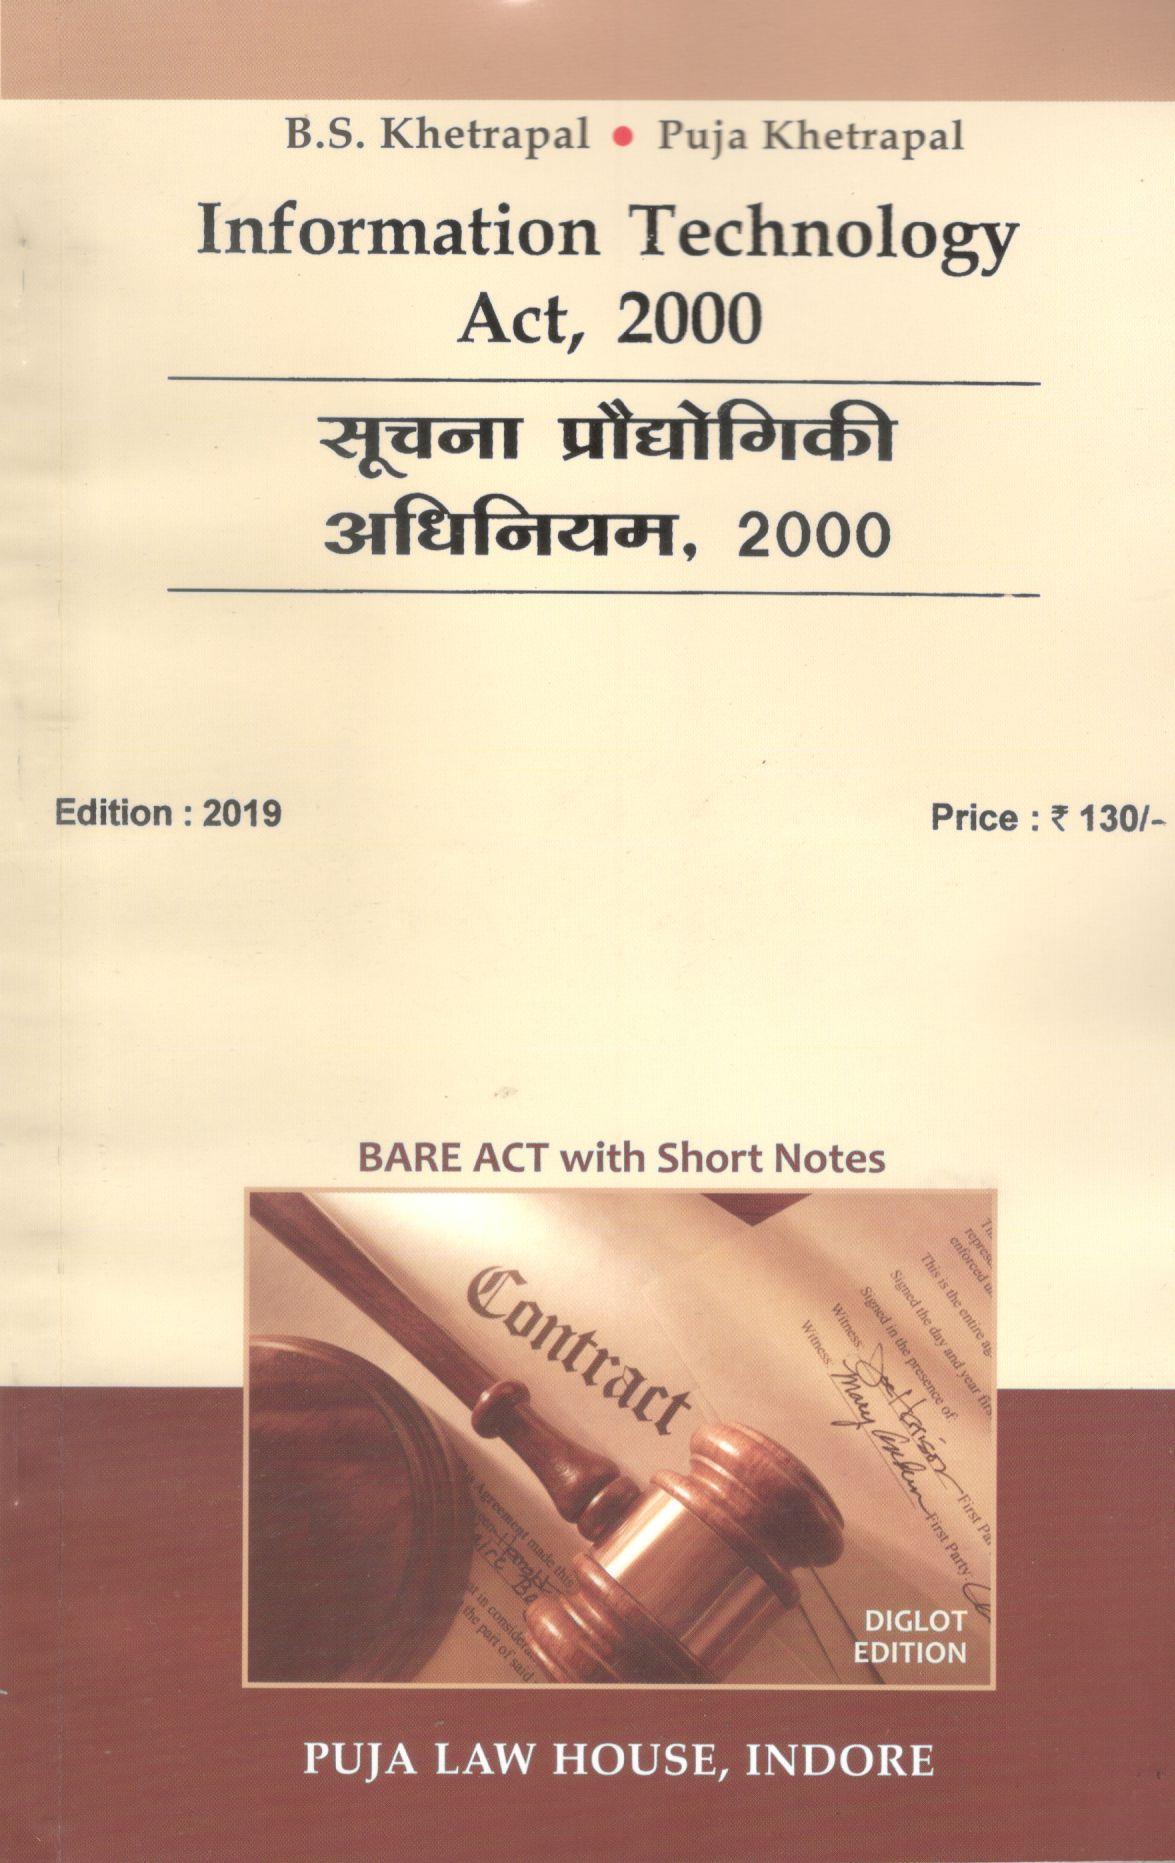 सूचना प्रौद्योगिकी अधिनियम, 2000 / Information Technology Act, 2000